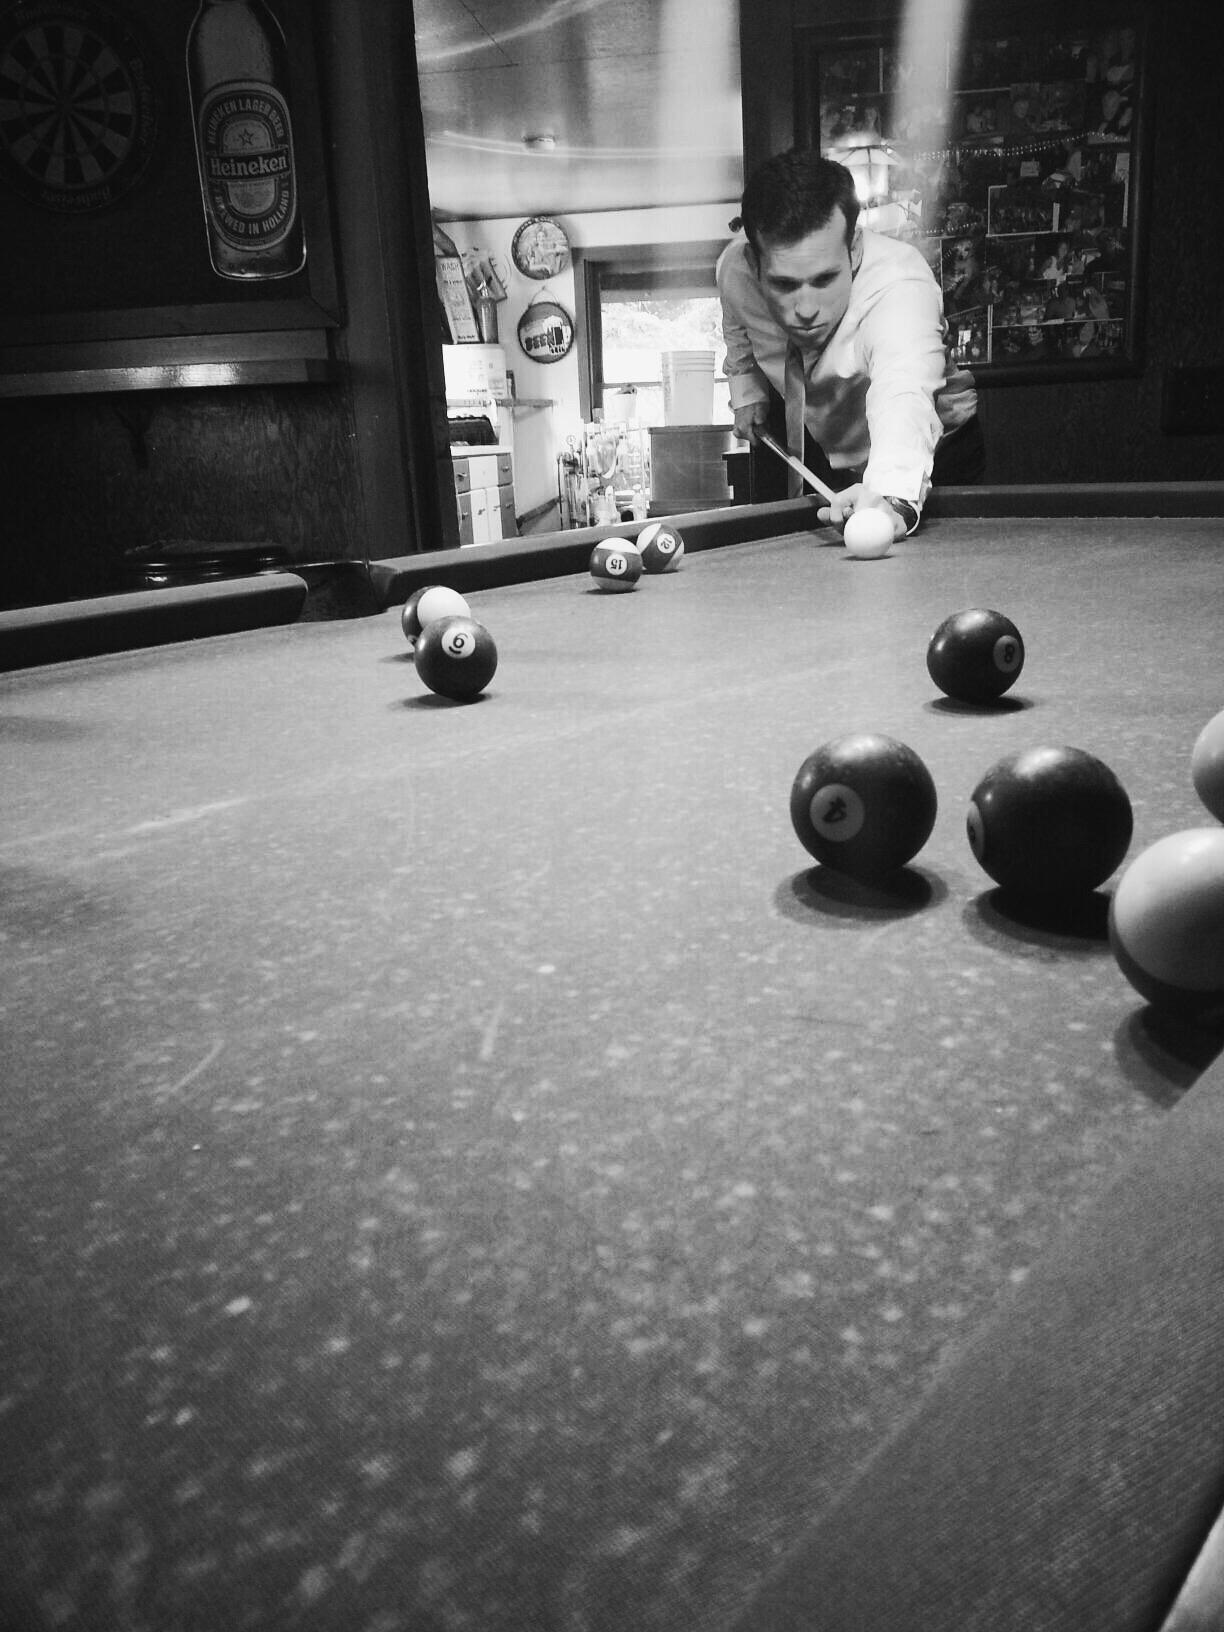 Playing-pool-BW_heatherbyhand.JPG